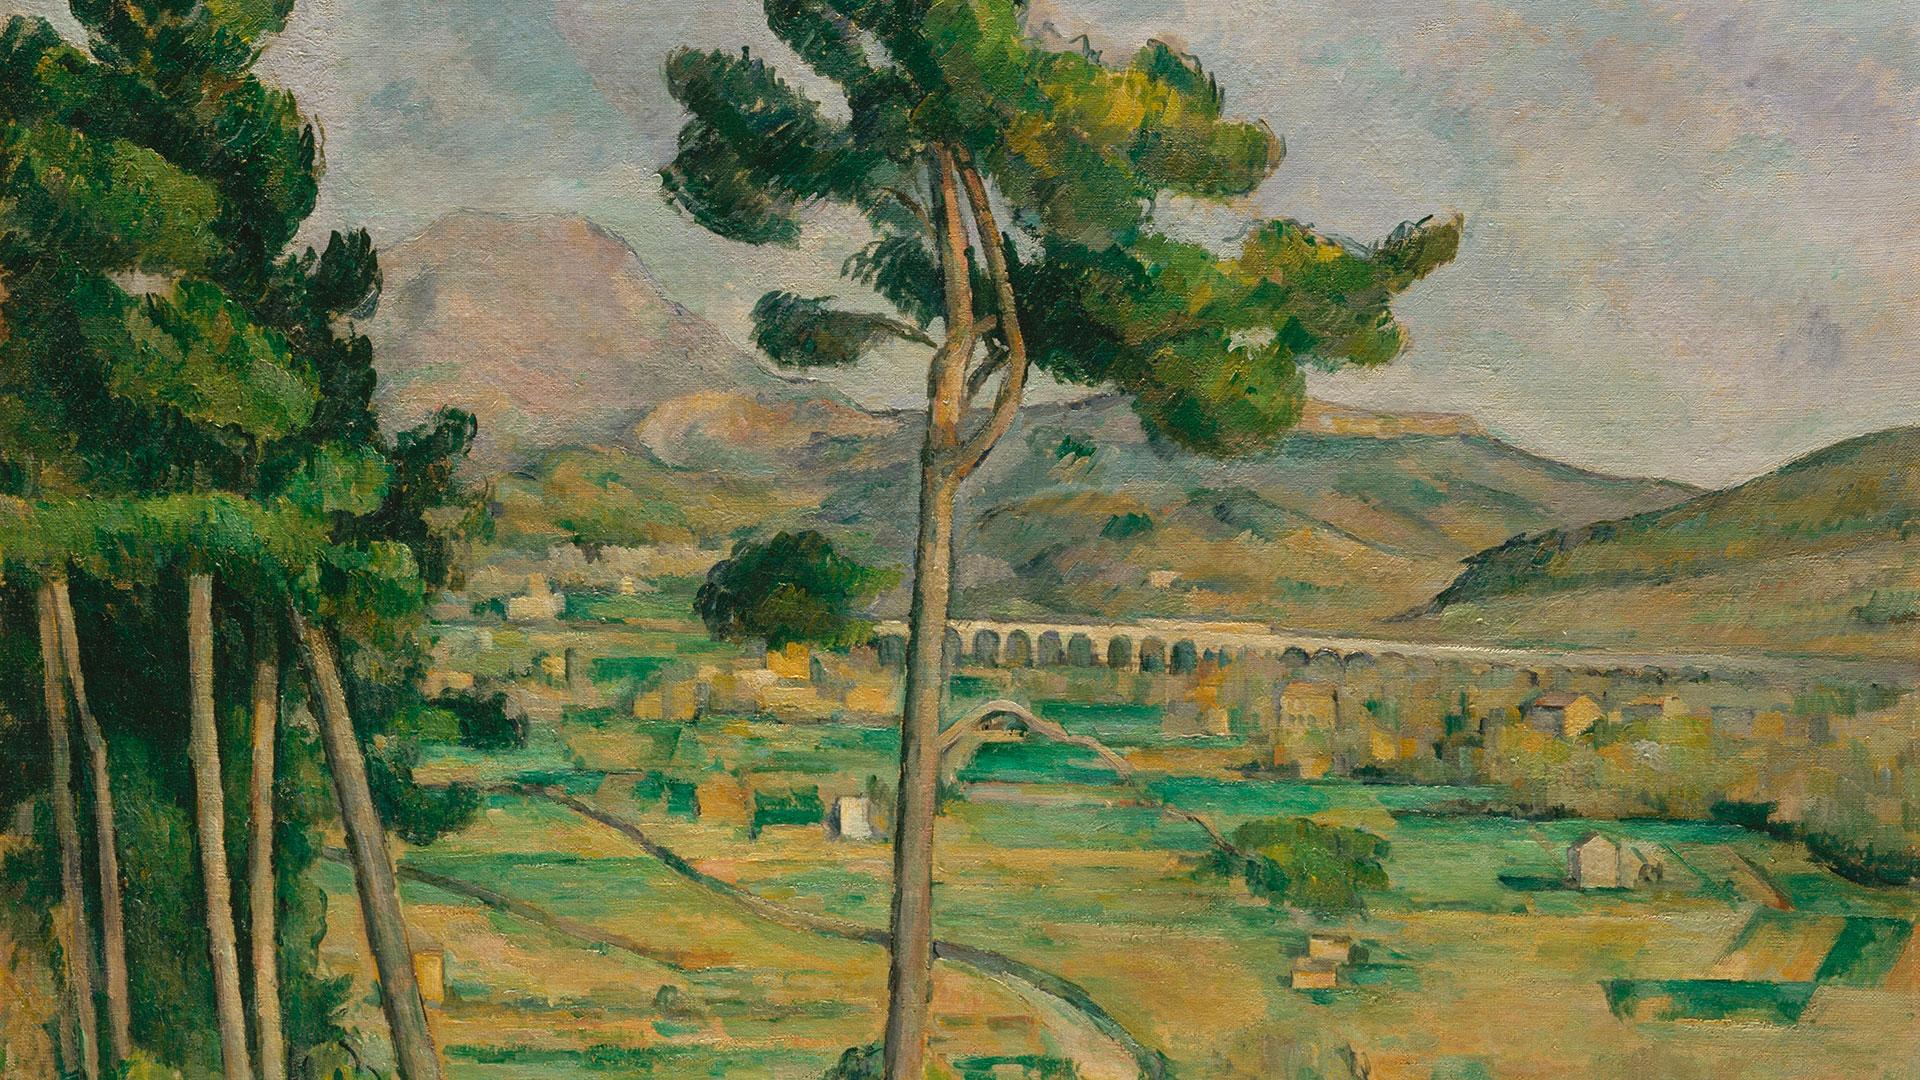 Cézanne hero asset